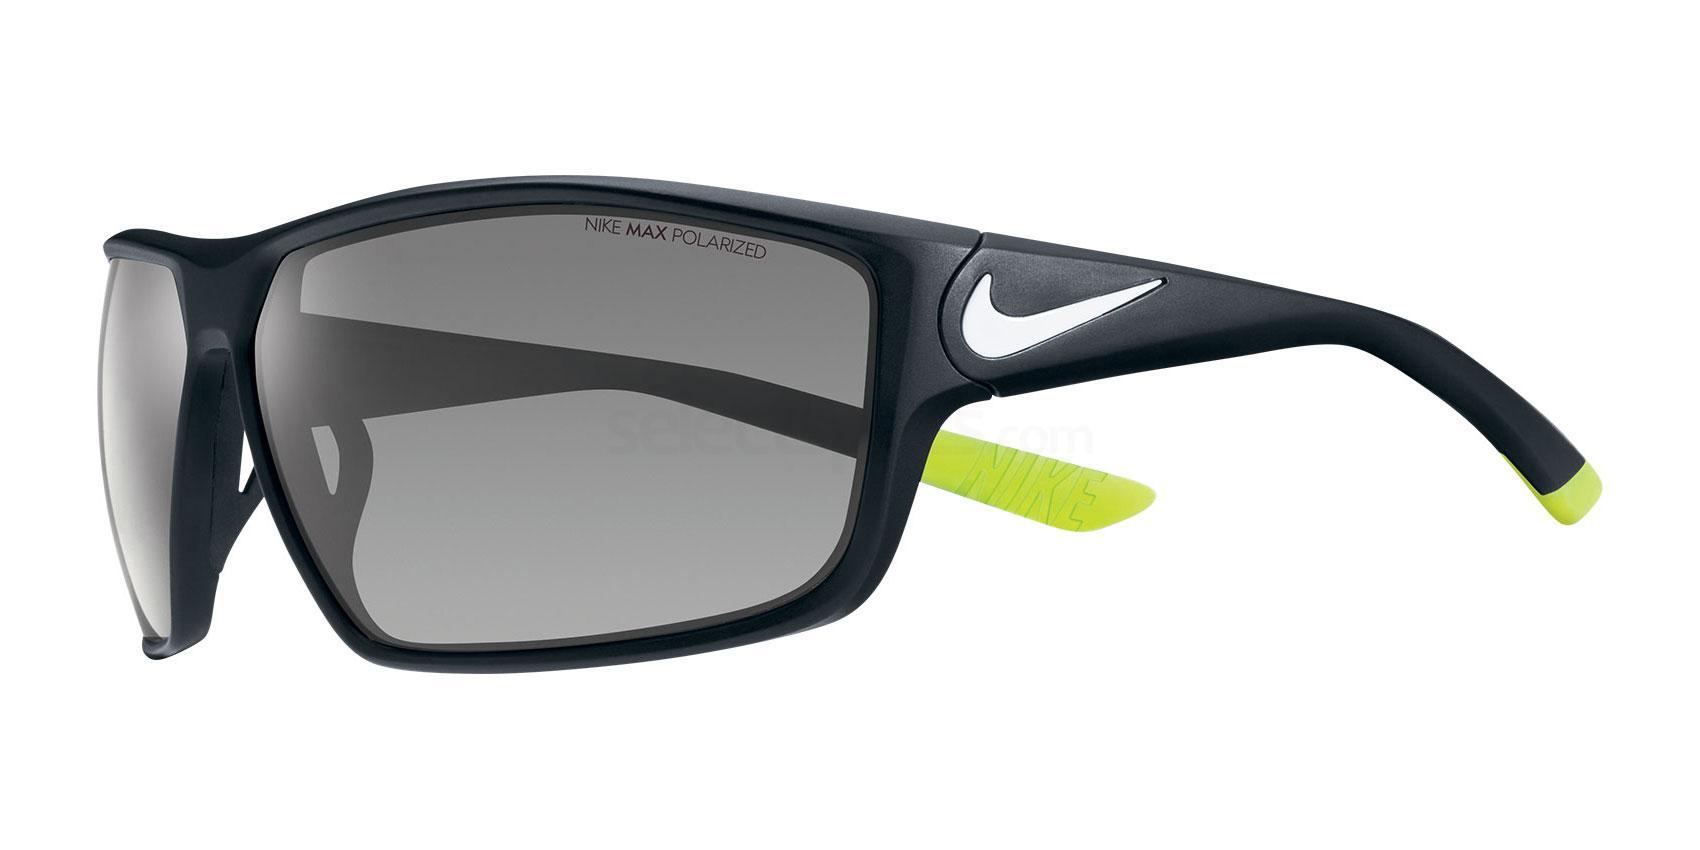 010 NIKE IGNITION P EV0868 Sunglasses, Nike